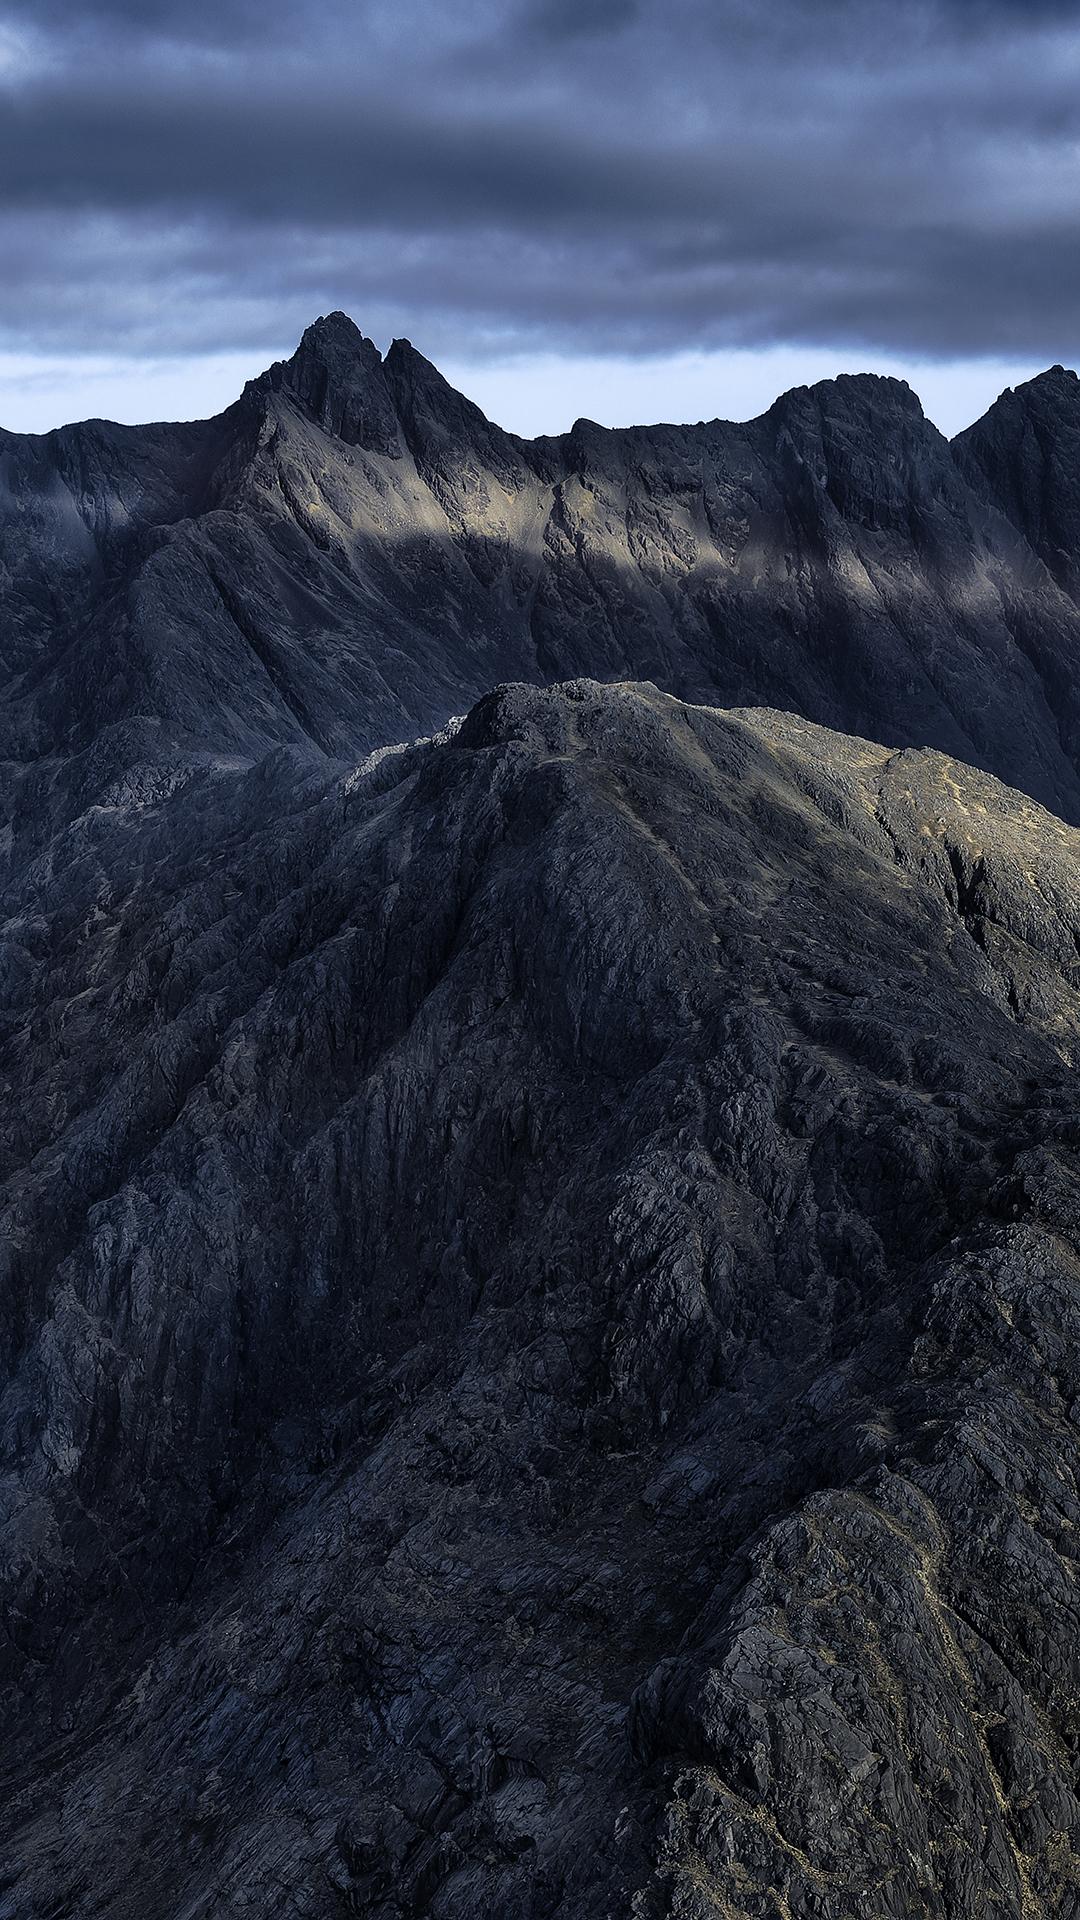 General 1080x1920 nature landscape portrait display mountains sunlight clouds